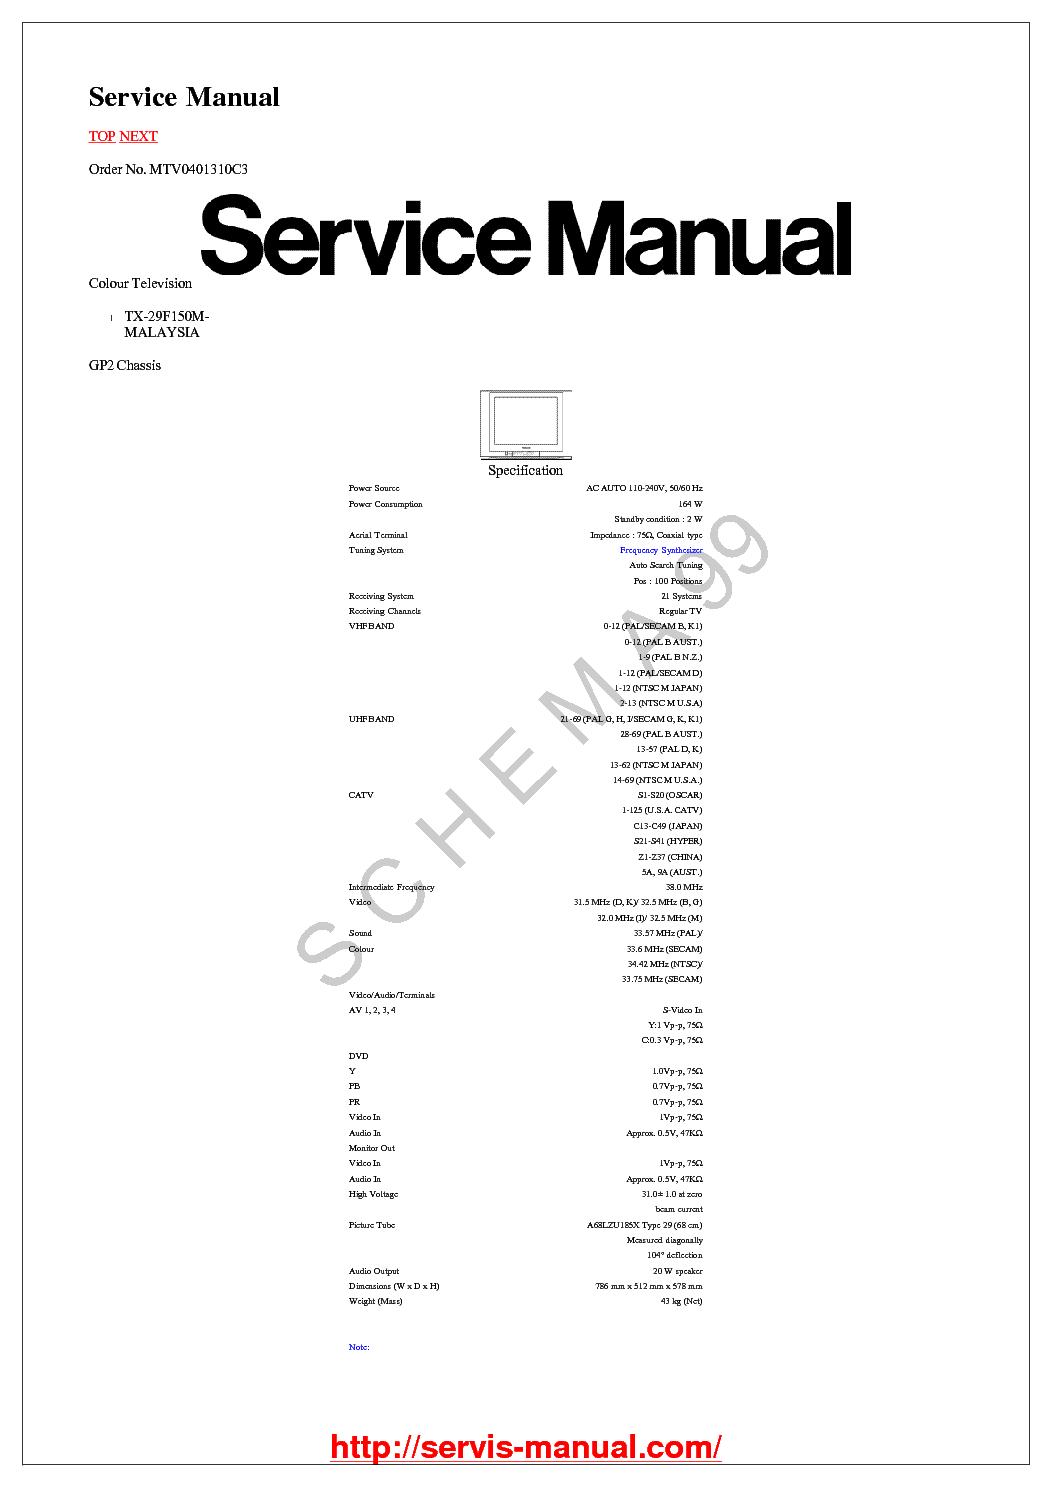 Panasonic Tc 21fx30l 29fx30l Chassis Gp41 Service Manual